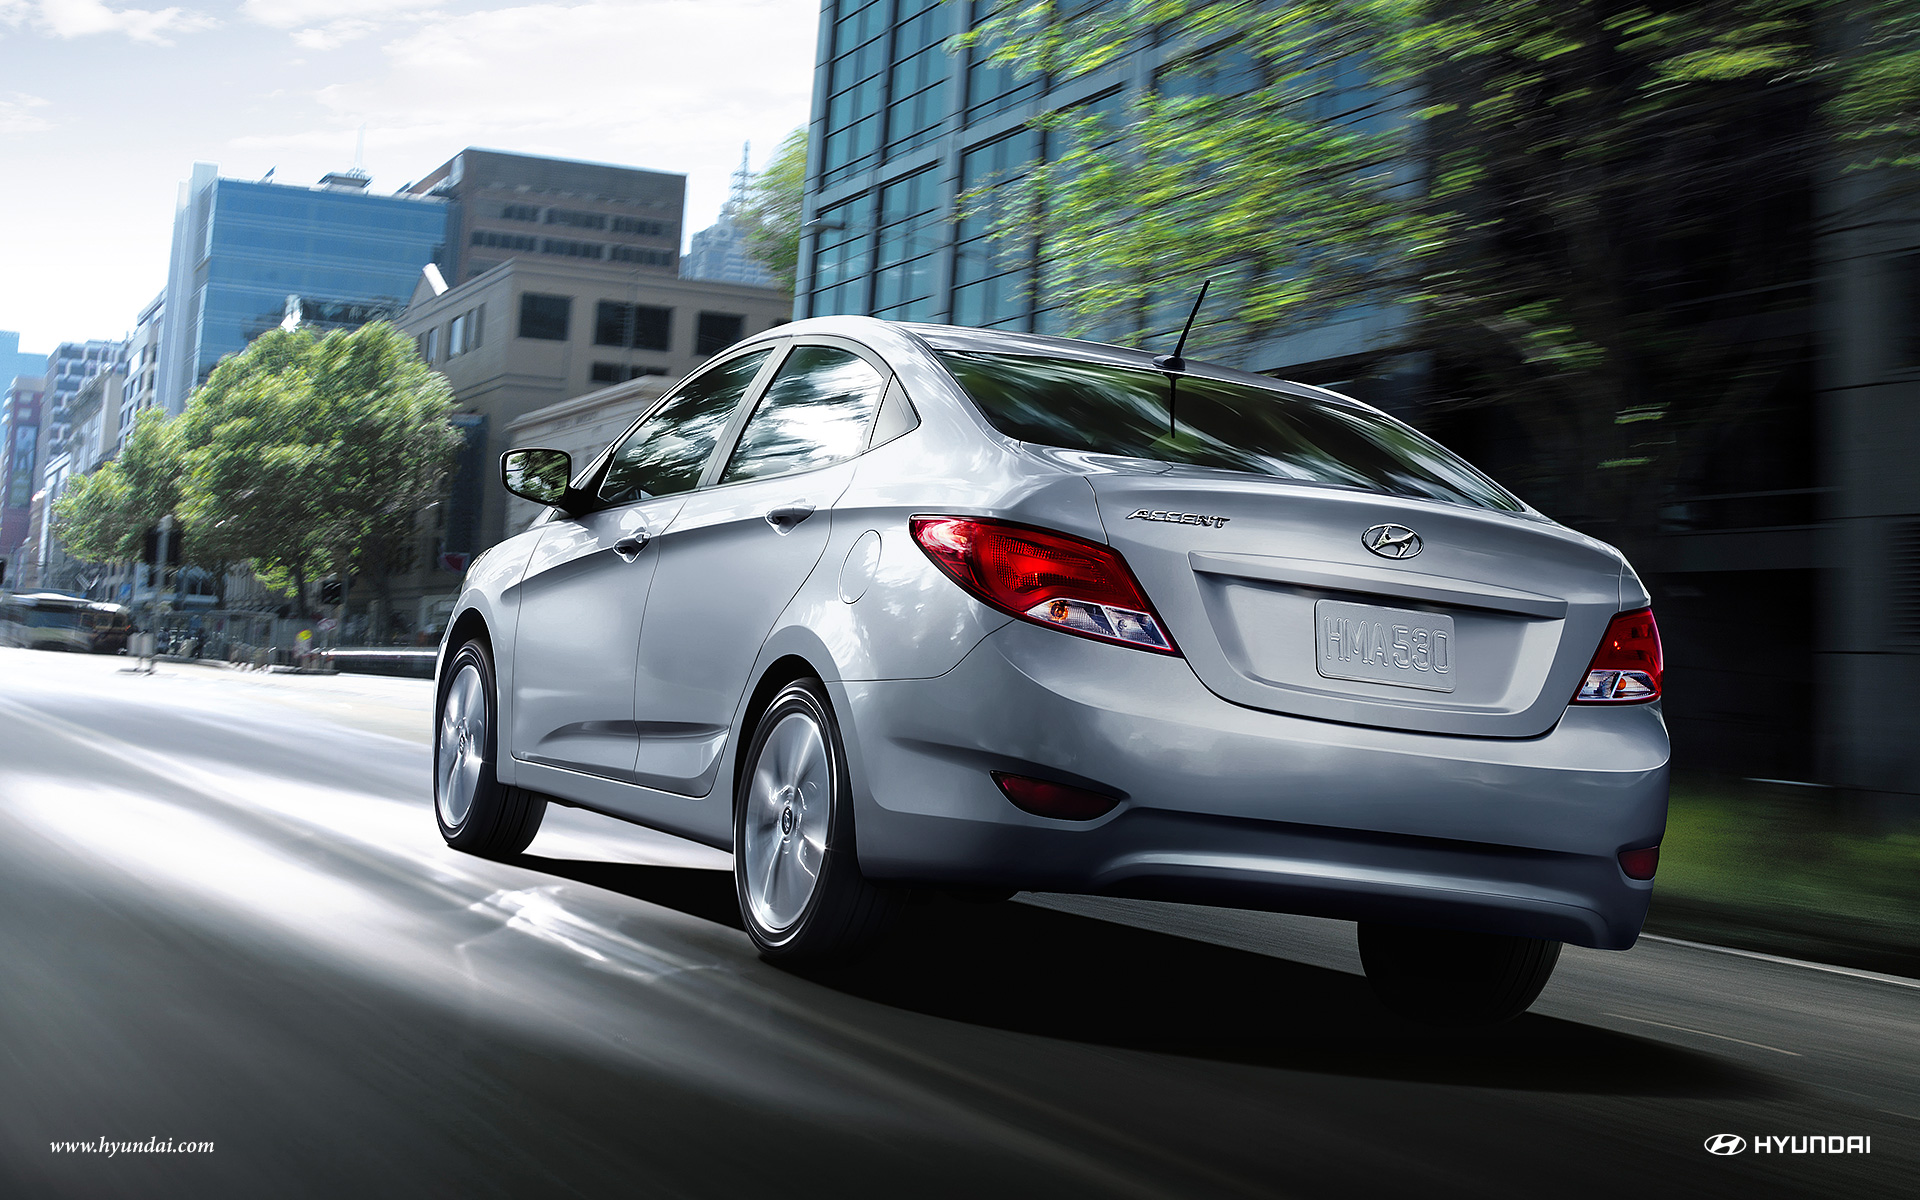 and motor elantra cars videos hyundai en canada reviews front accent sport rating sedan angular trend photos